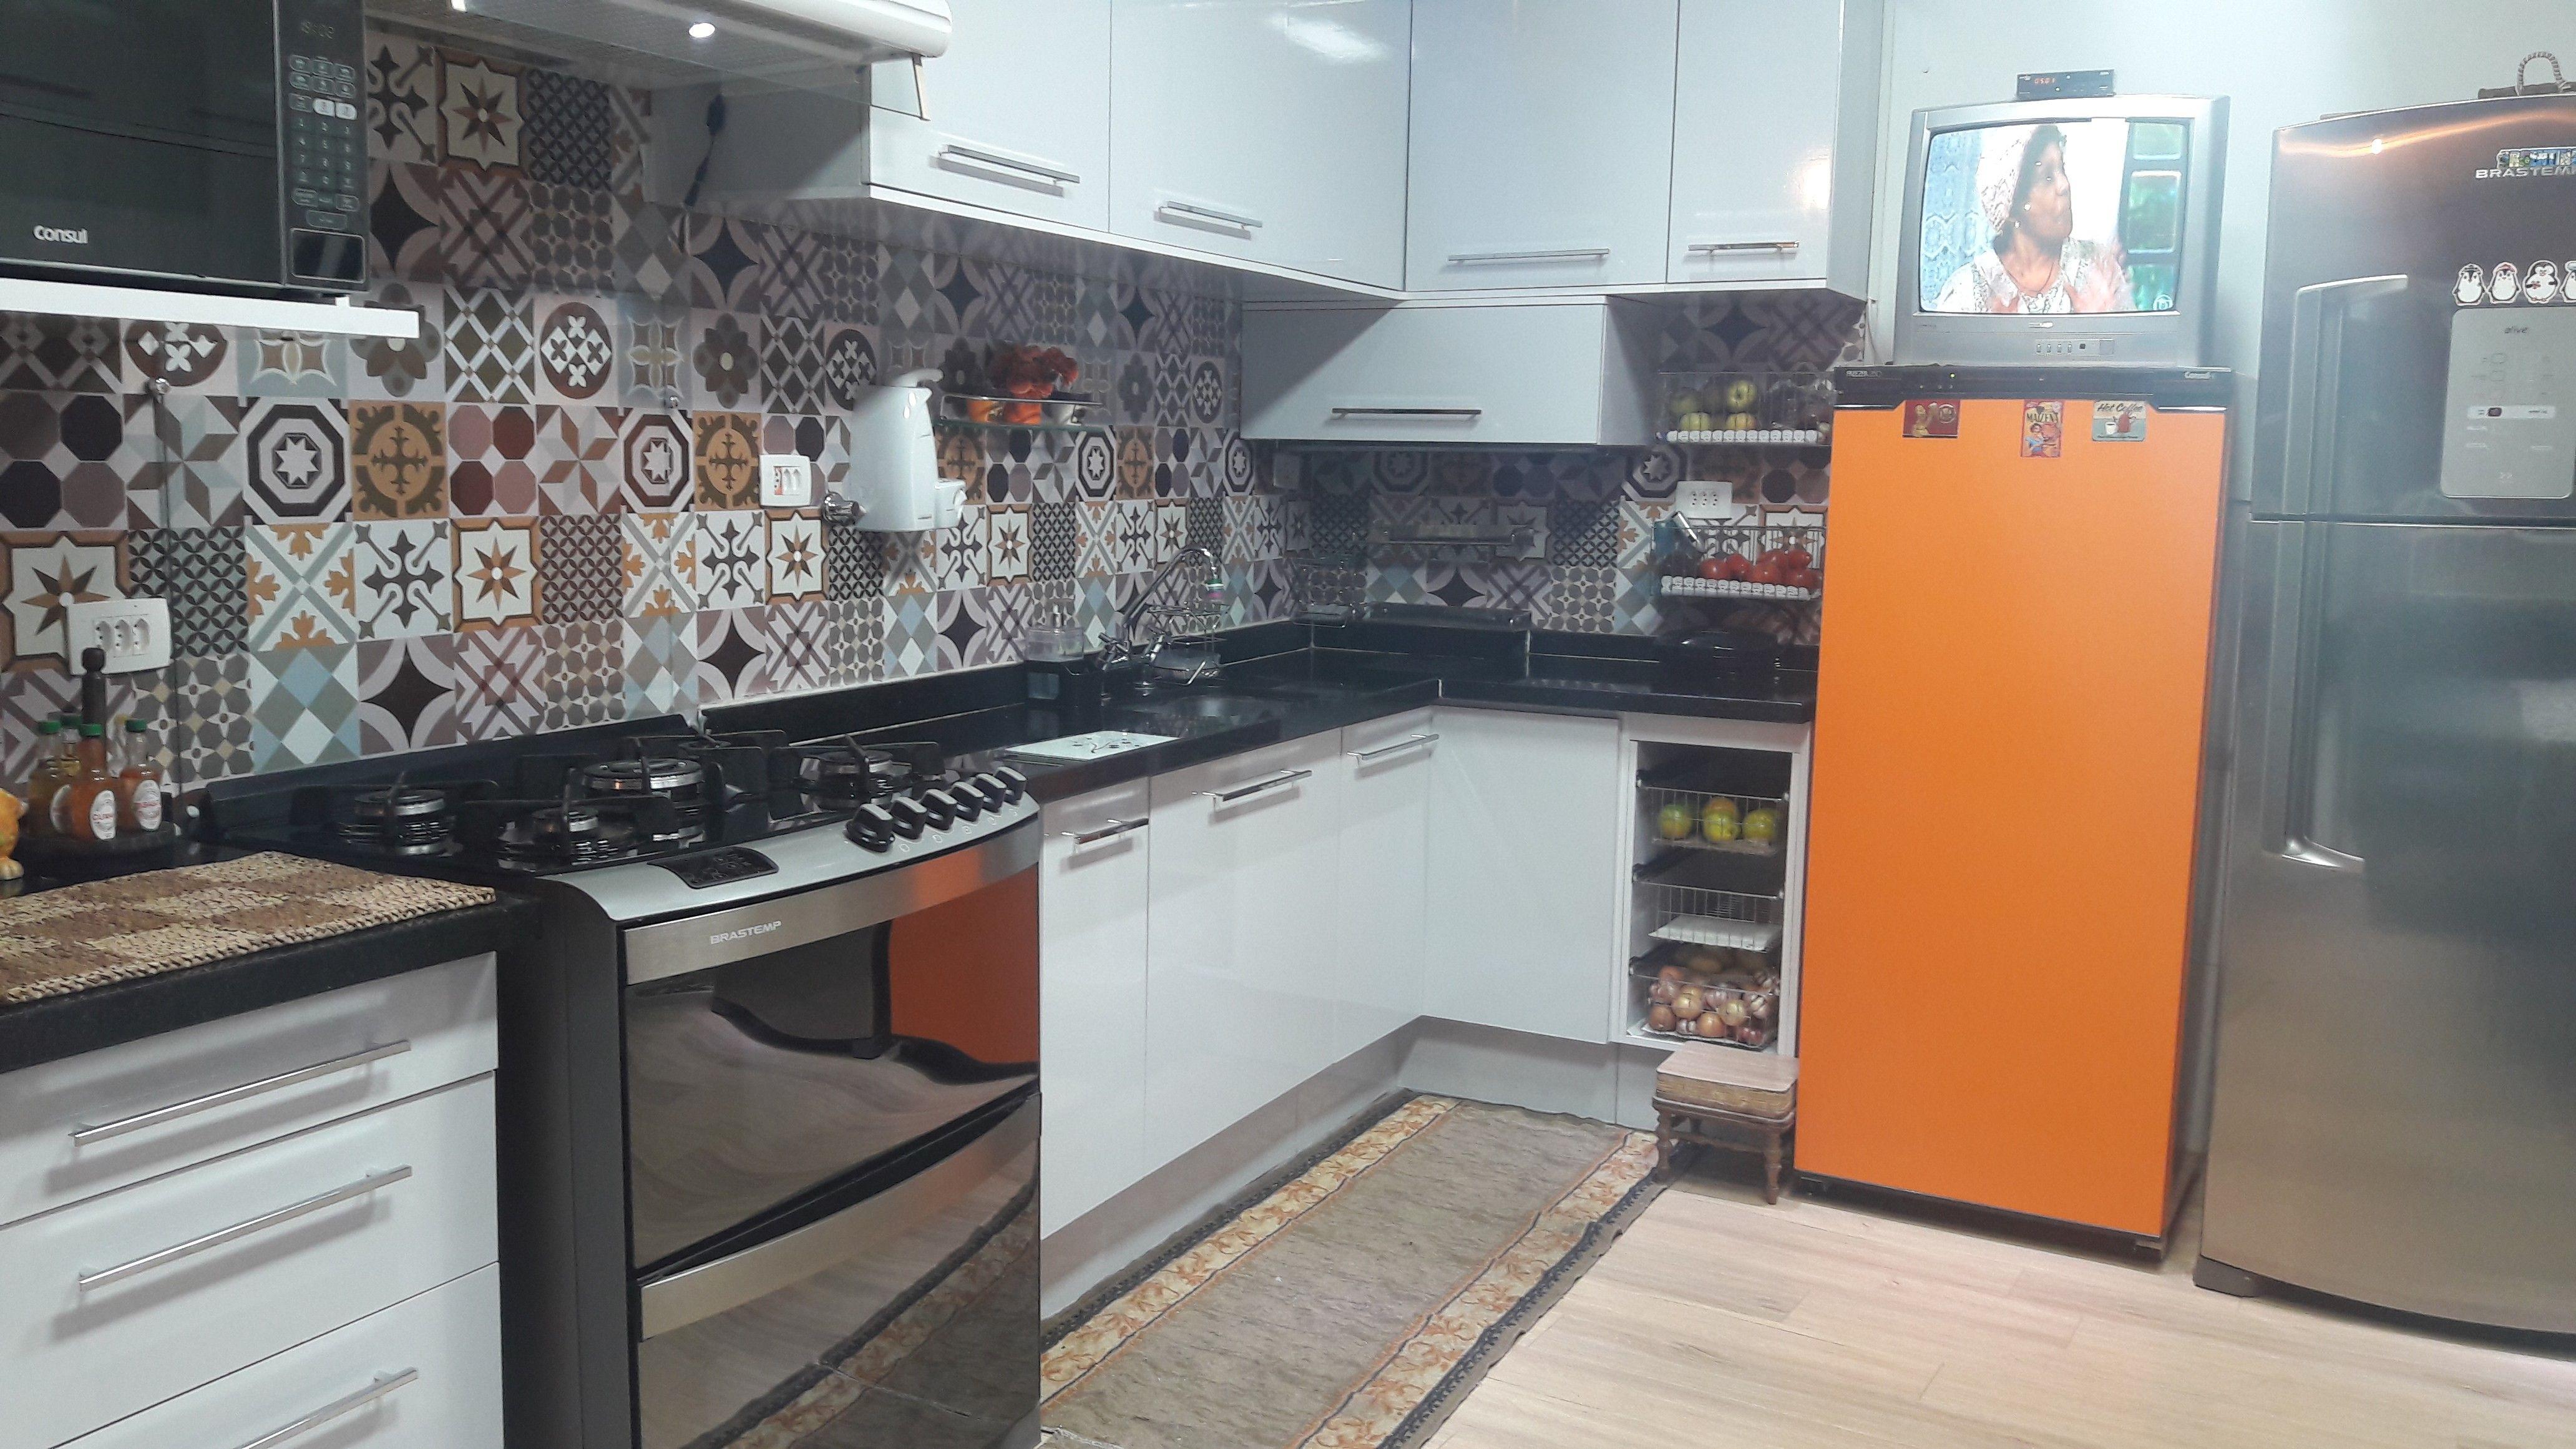 Cozinha Com Adesivo Hidraulico Freezer Adesivado Com Vinil Laranja